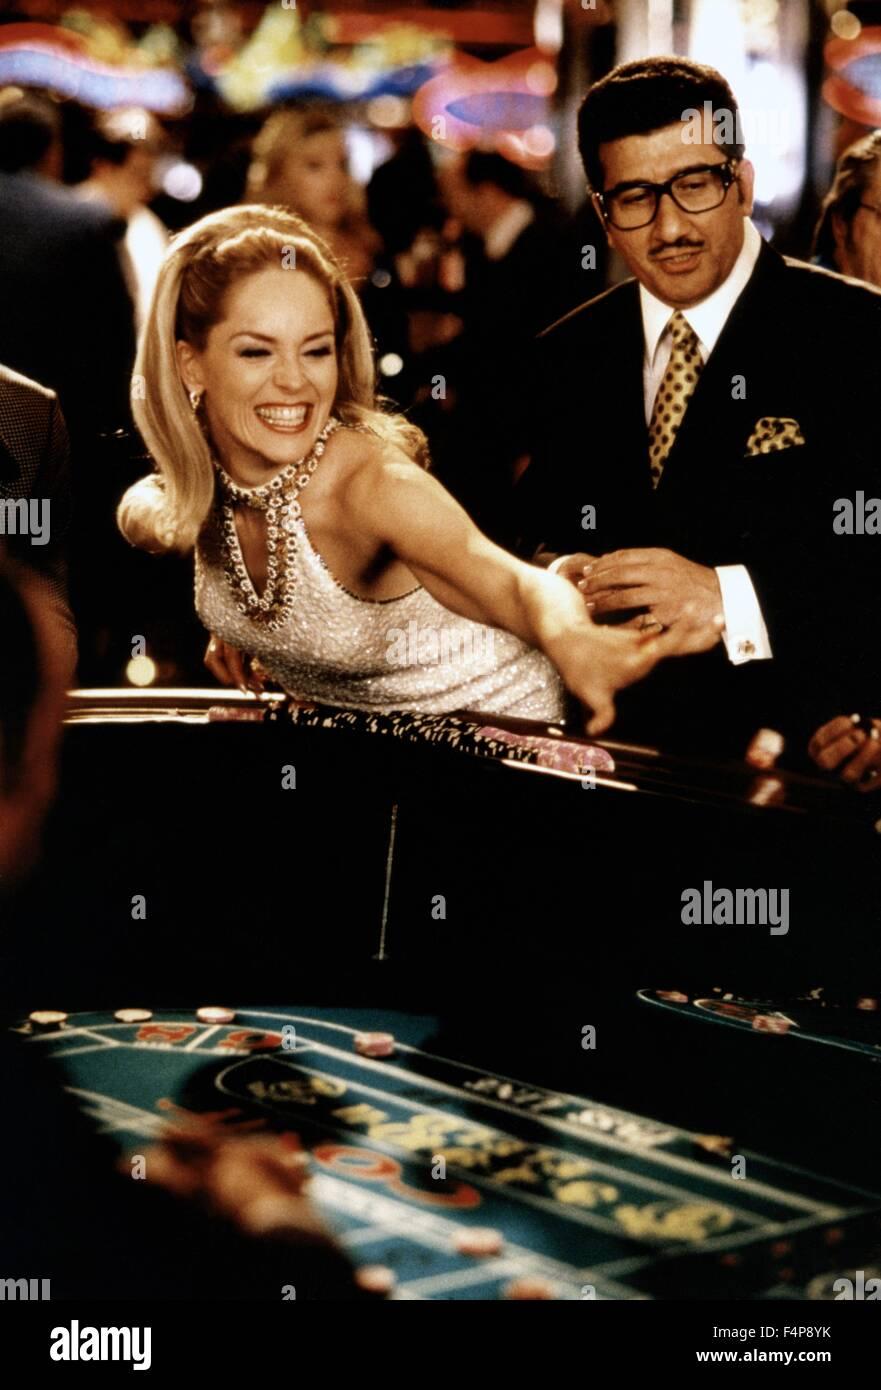 Sharon Stone / Casino 1995 directed by Martin Scorsese - Stock Image